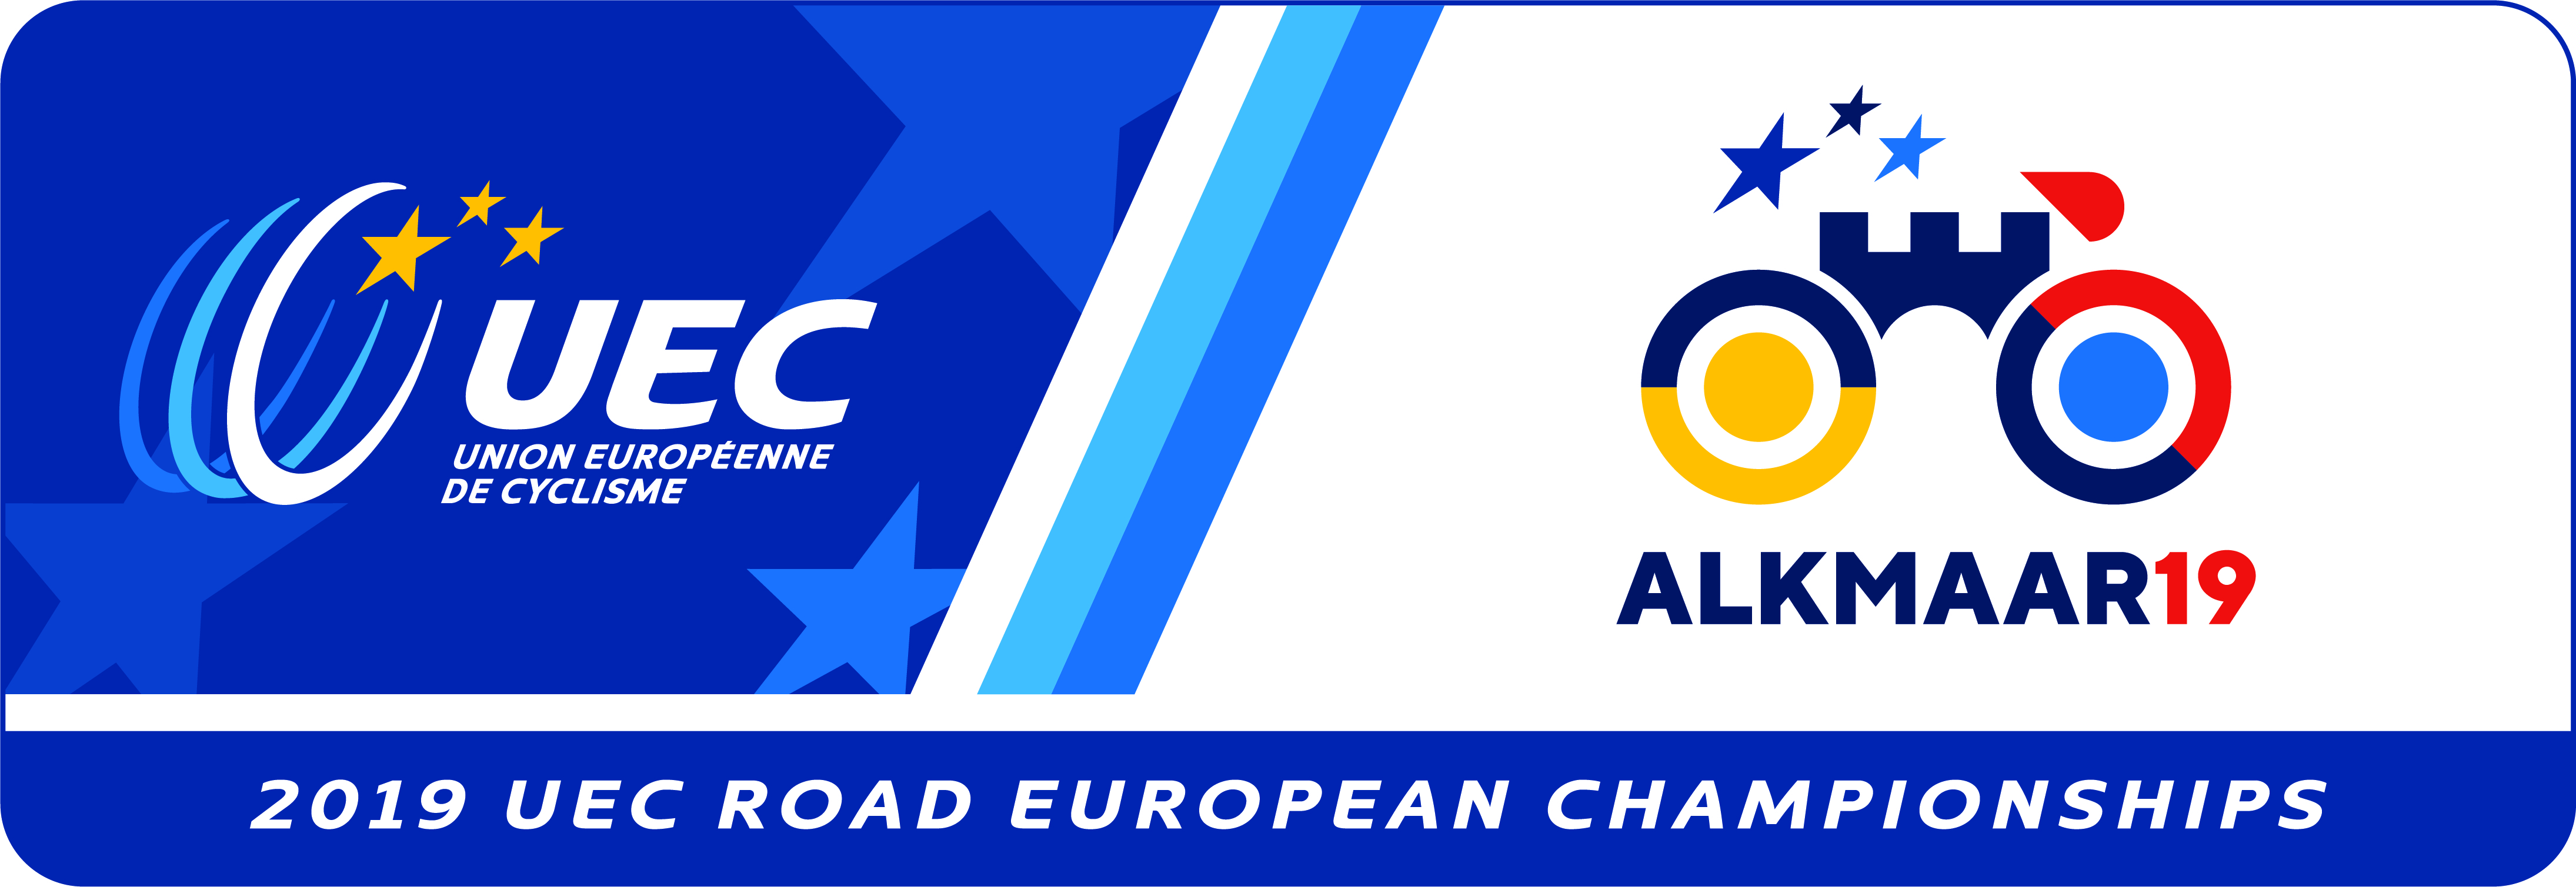 Championnats d'Europe 2019 UEC-ALKMAAR19-EVENT-BOX-LOGO-CMYK